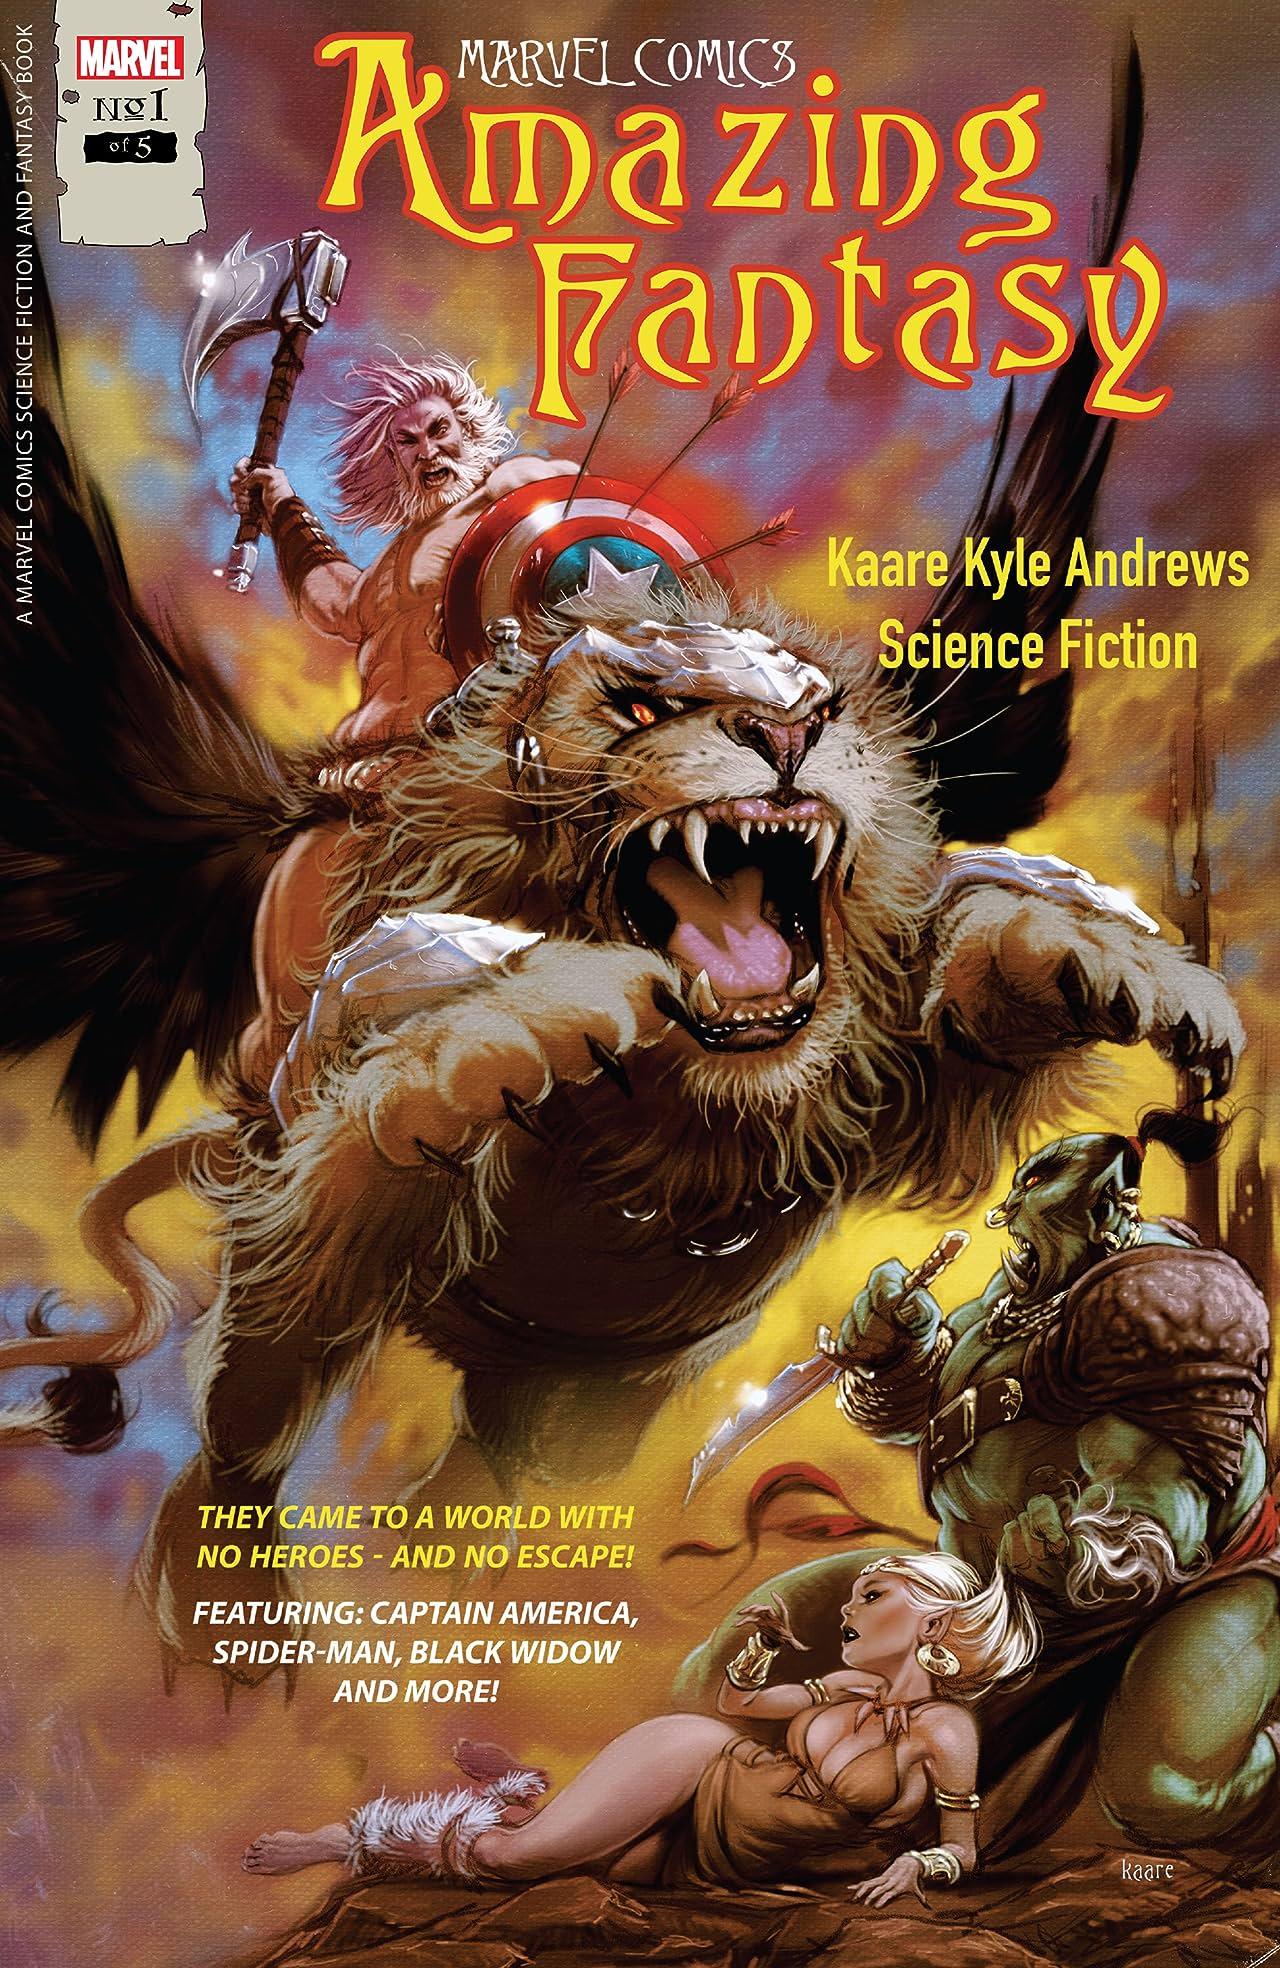 Amazing Fantasy (2021) #1 (of 5)